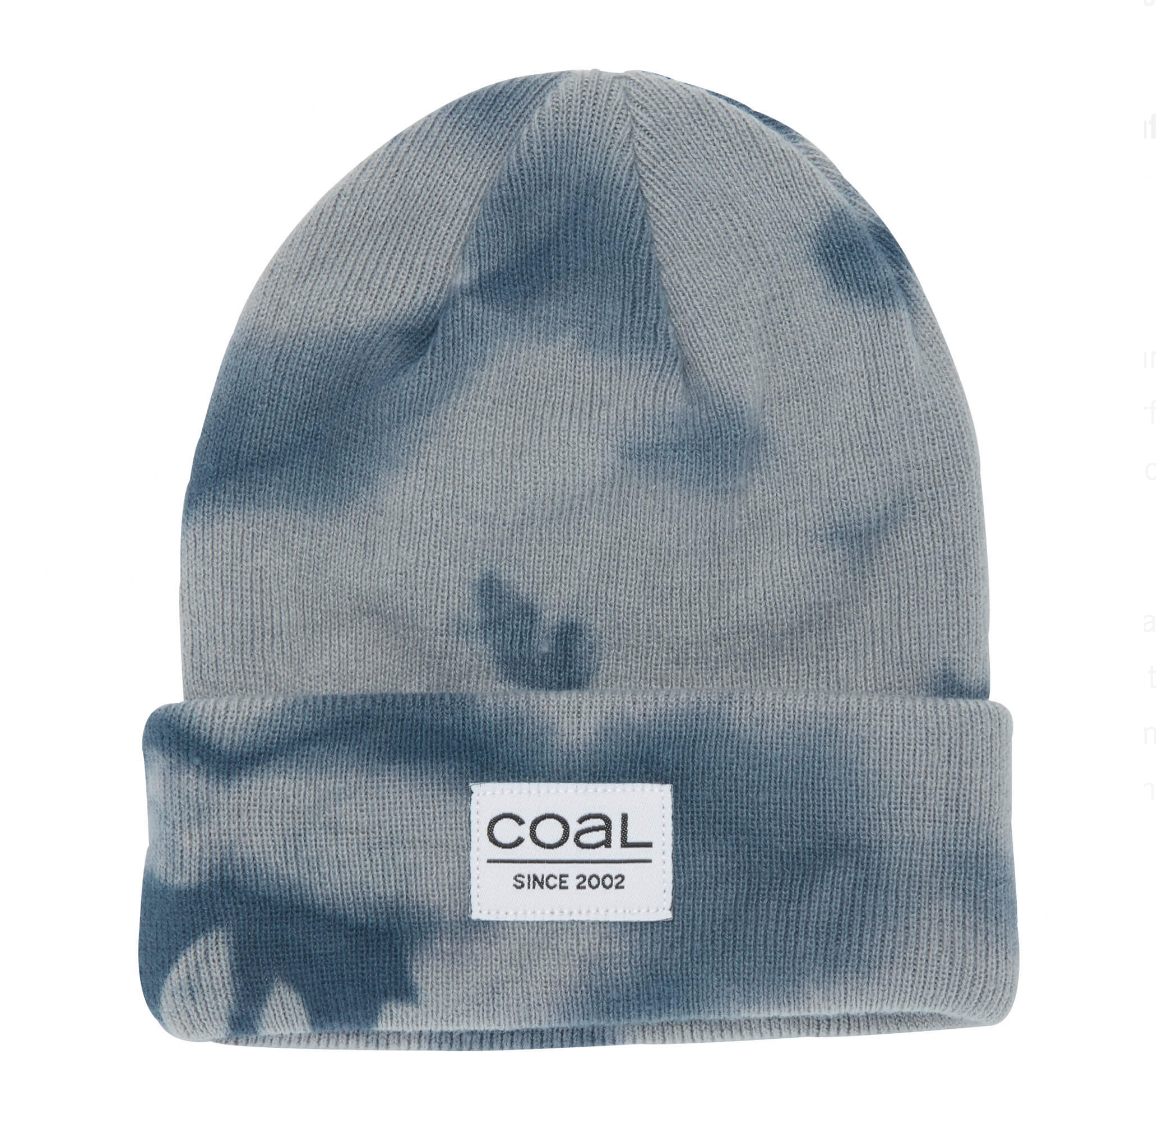 Coal The Standard Kids Cuffed Beanie - Grey Tie Dye